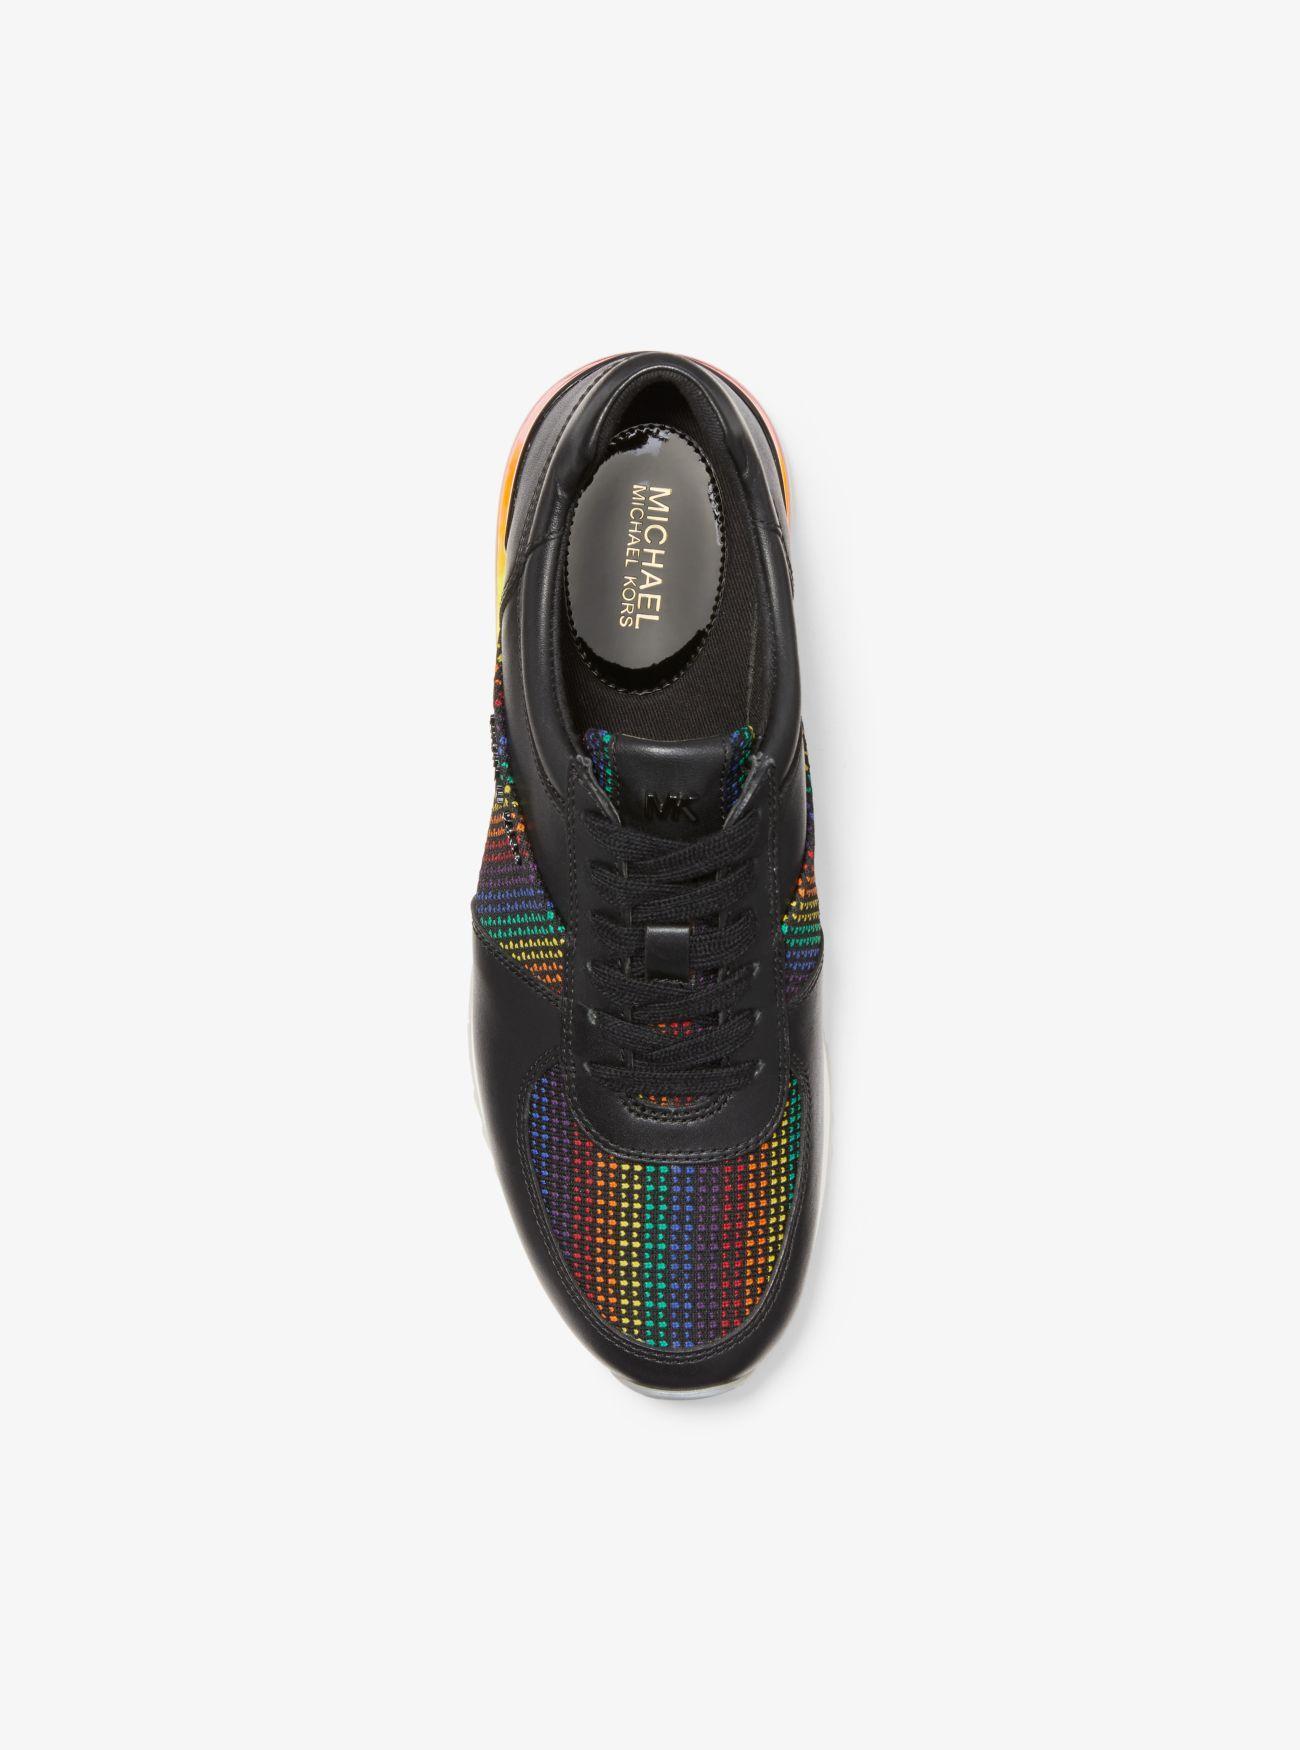 michael kors rainbow trainers